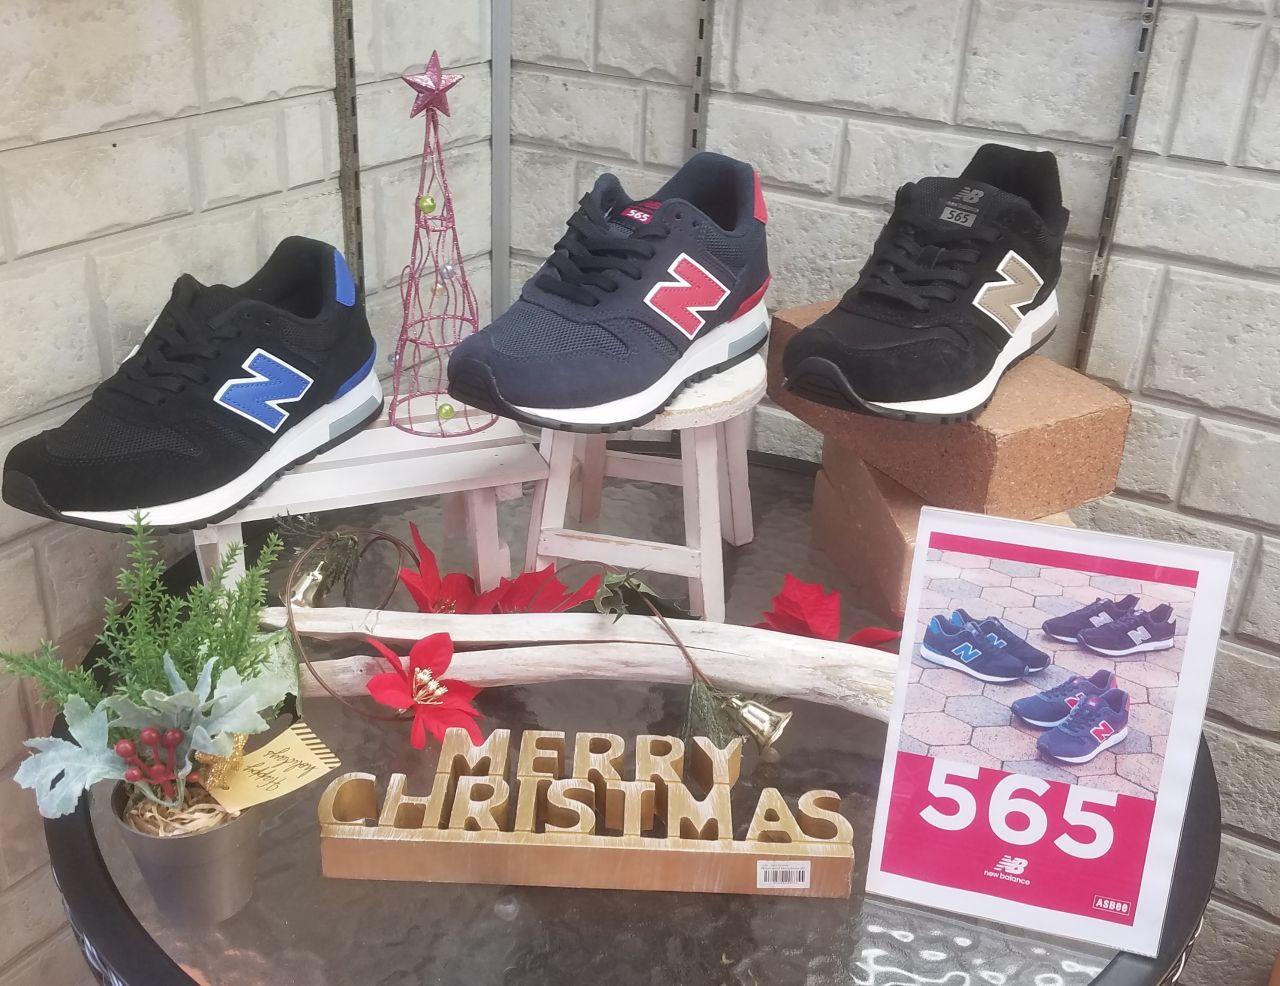 8f27053570f75 ☆NewBalance「565」シリーズ新作☆ | ASBee 横浜店 | G-FOOT ...